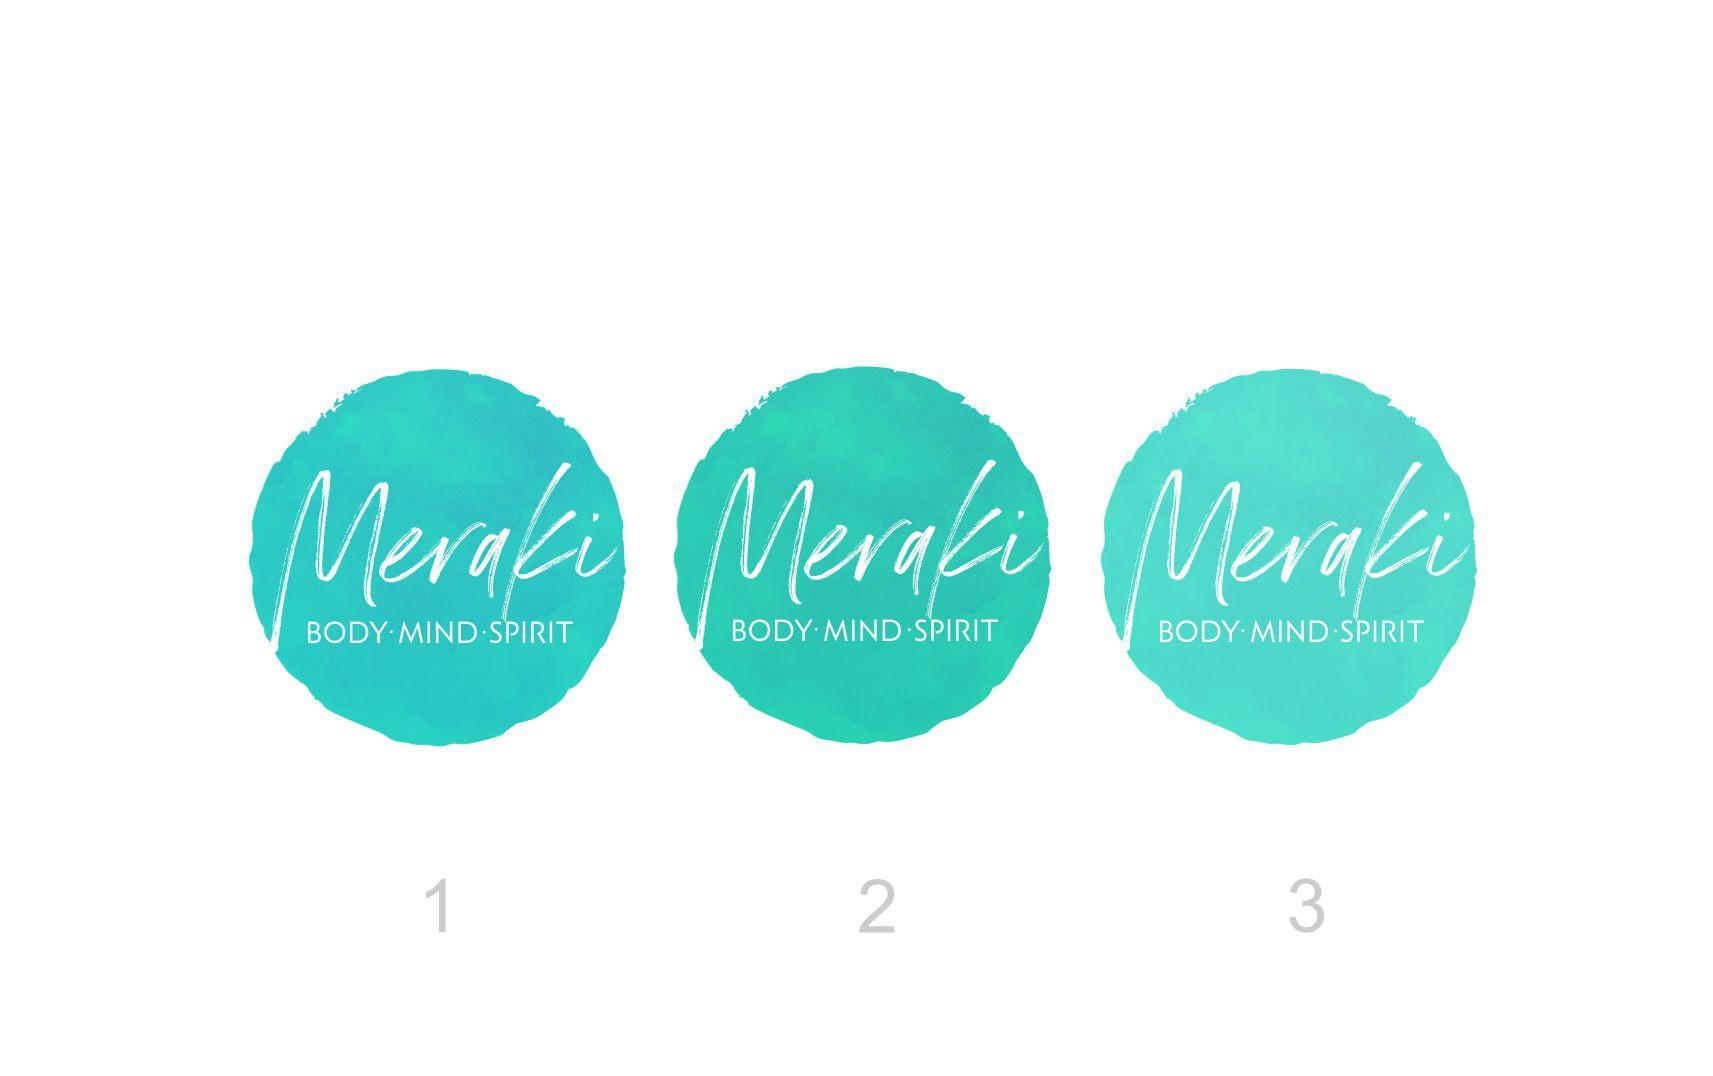 Meraki: A platform - Holistic Approach- Health & Wellness